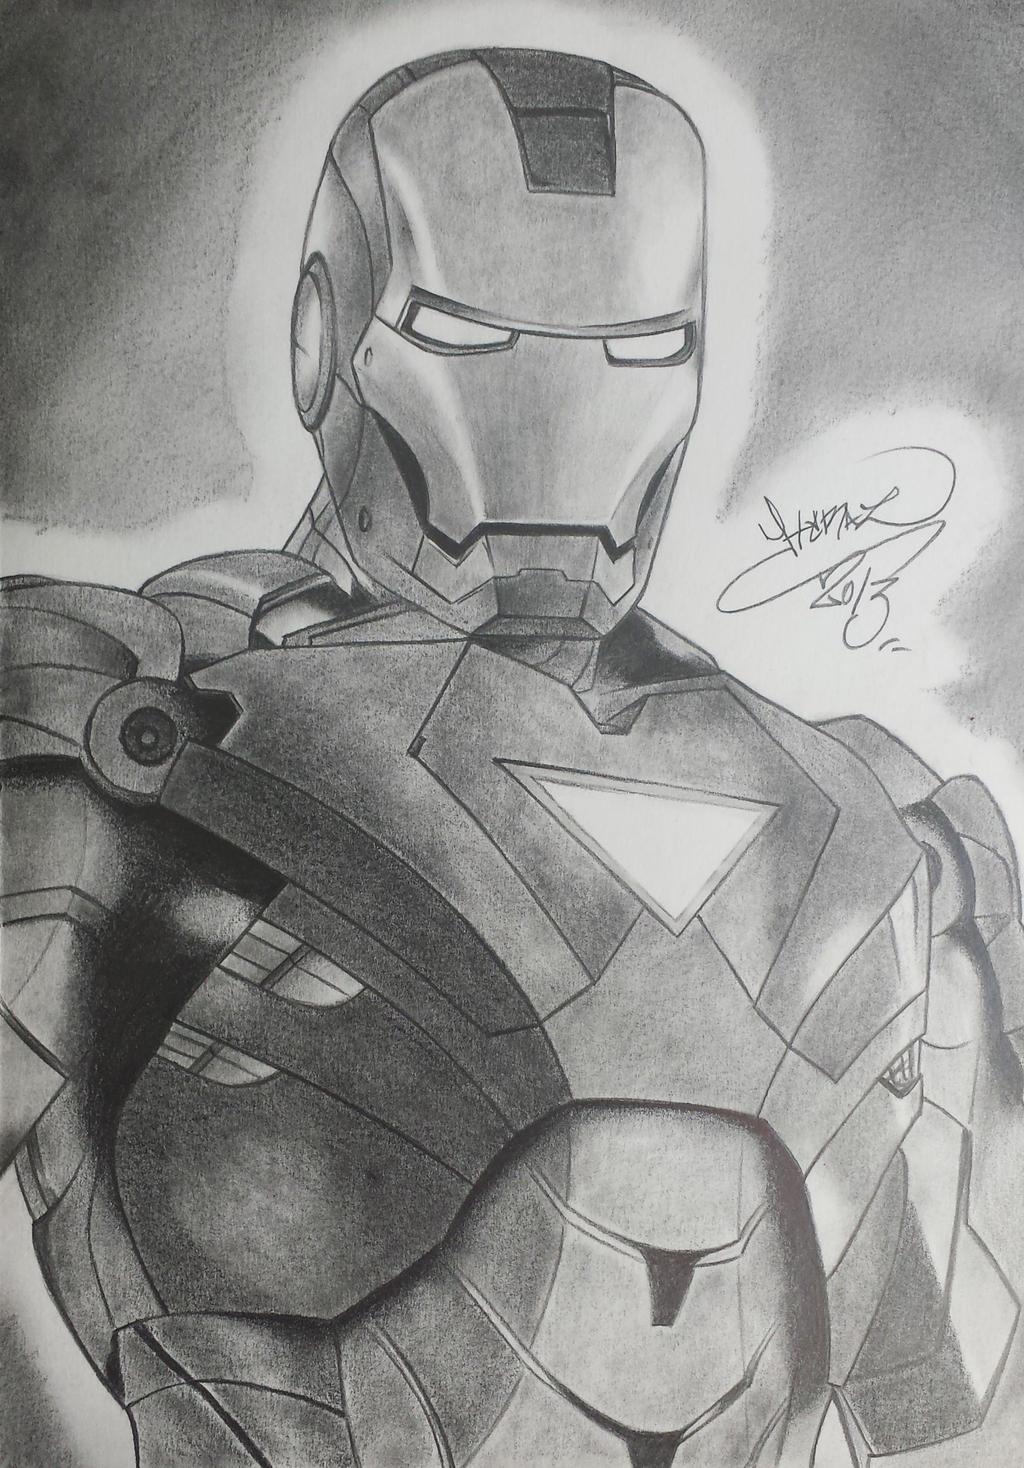 Iron Man Drawing By Erazer-Drawings On DeviantArt